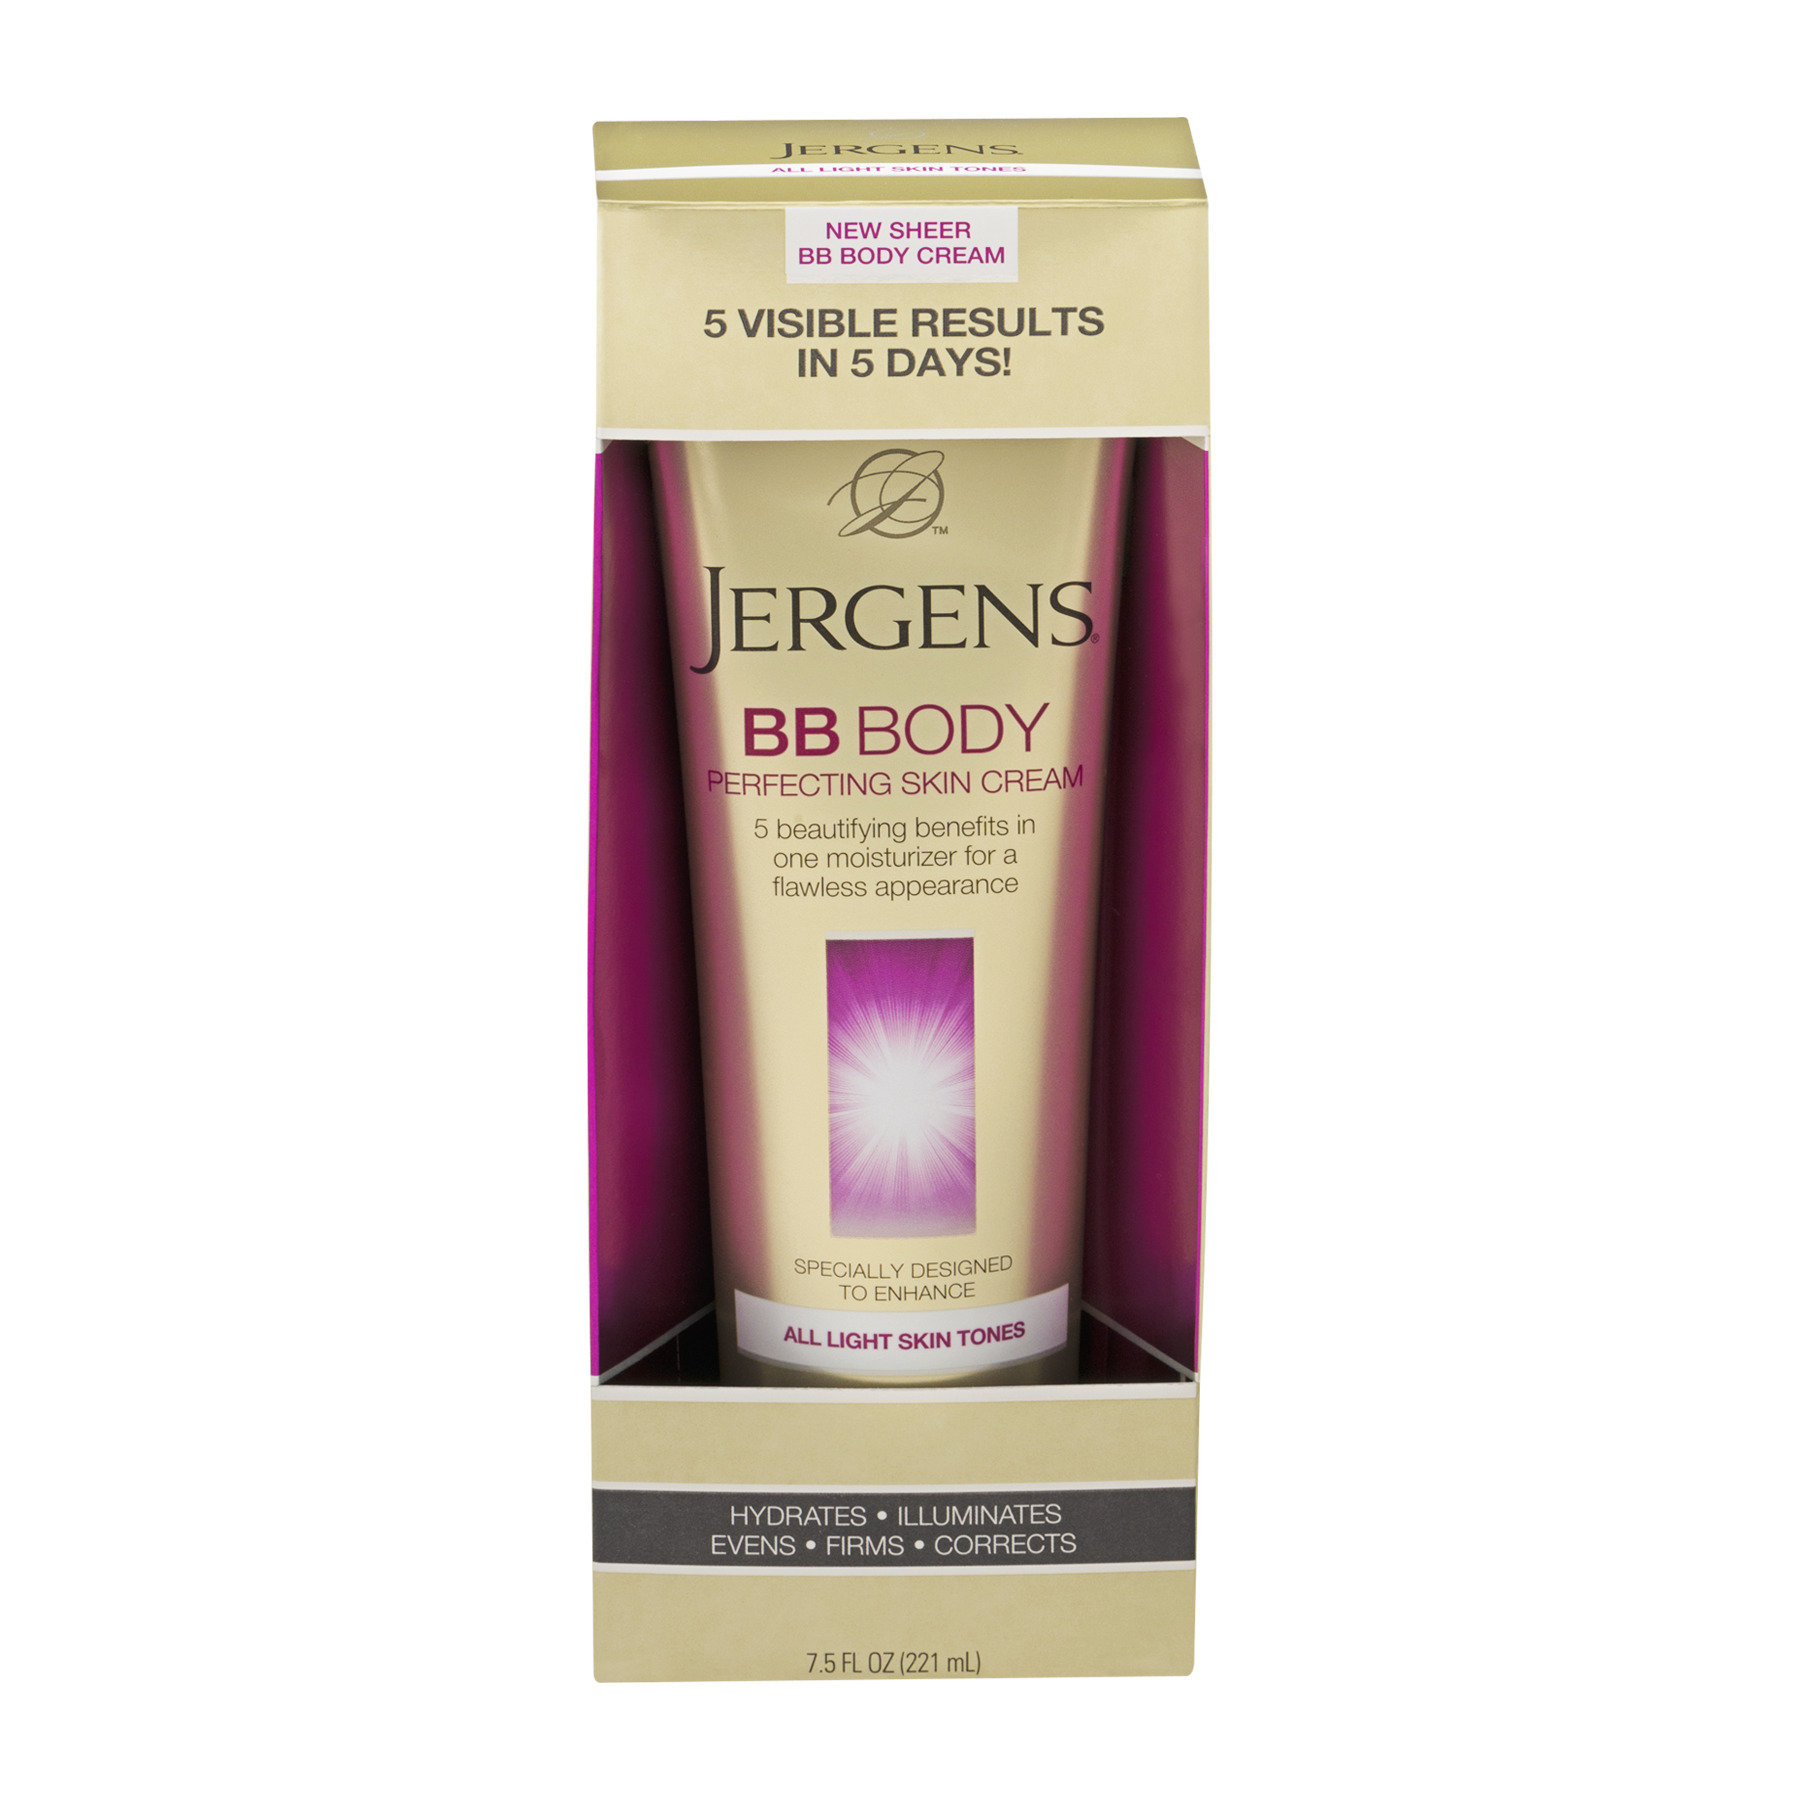 Jergens® All Light Skin Tones BB Body Perfecting Skin Cream 7.5 fl. oz. Box